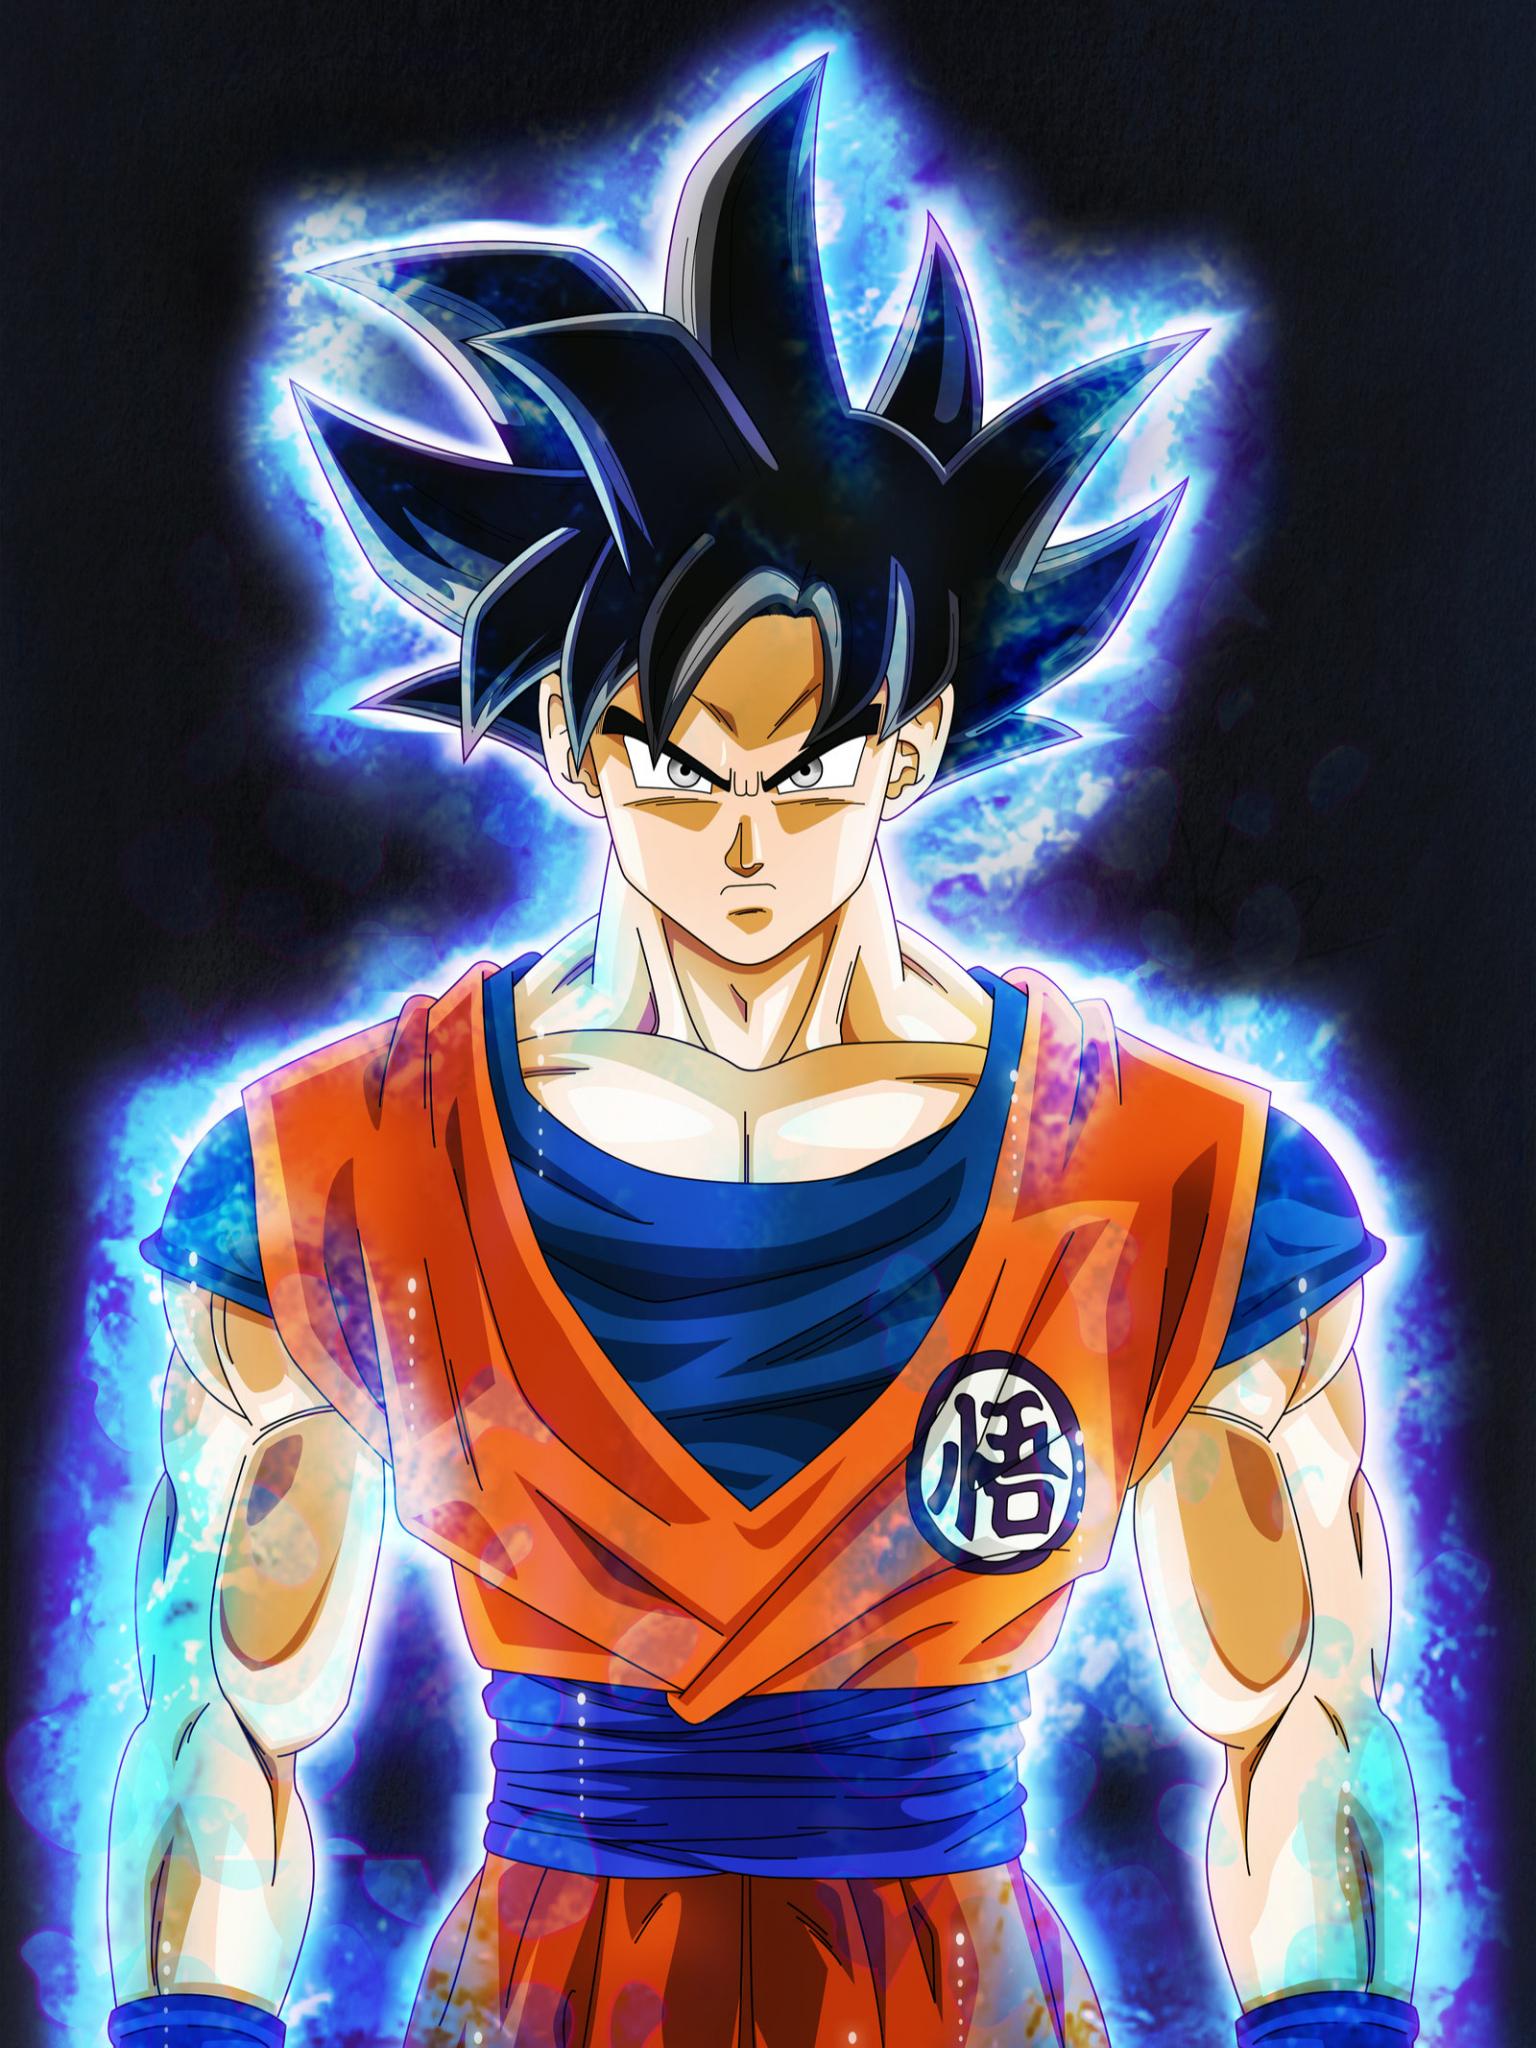 Free Download Anime 2017 Goku Migatte No Gokui Wallpaper 69501